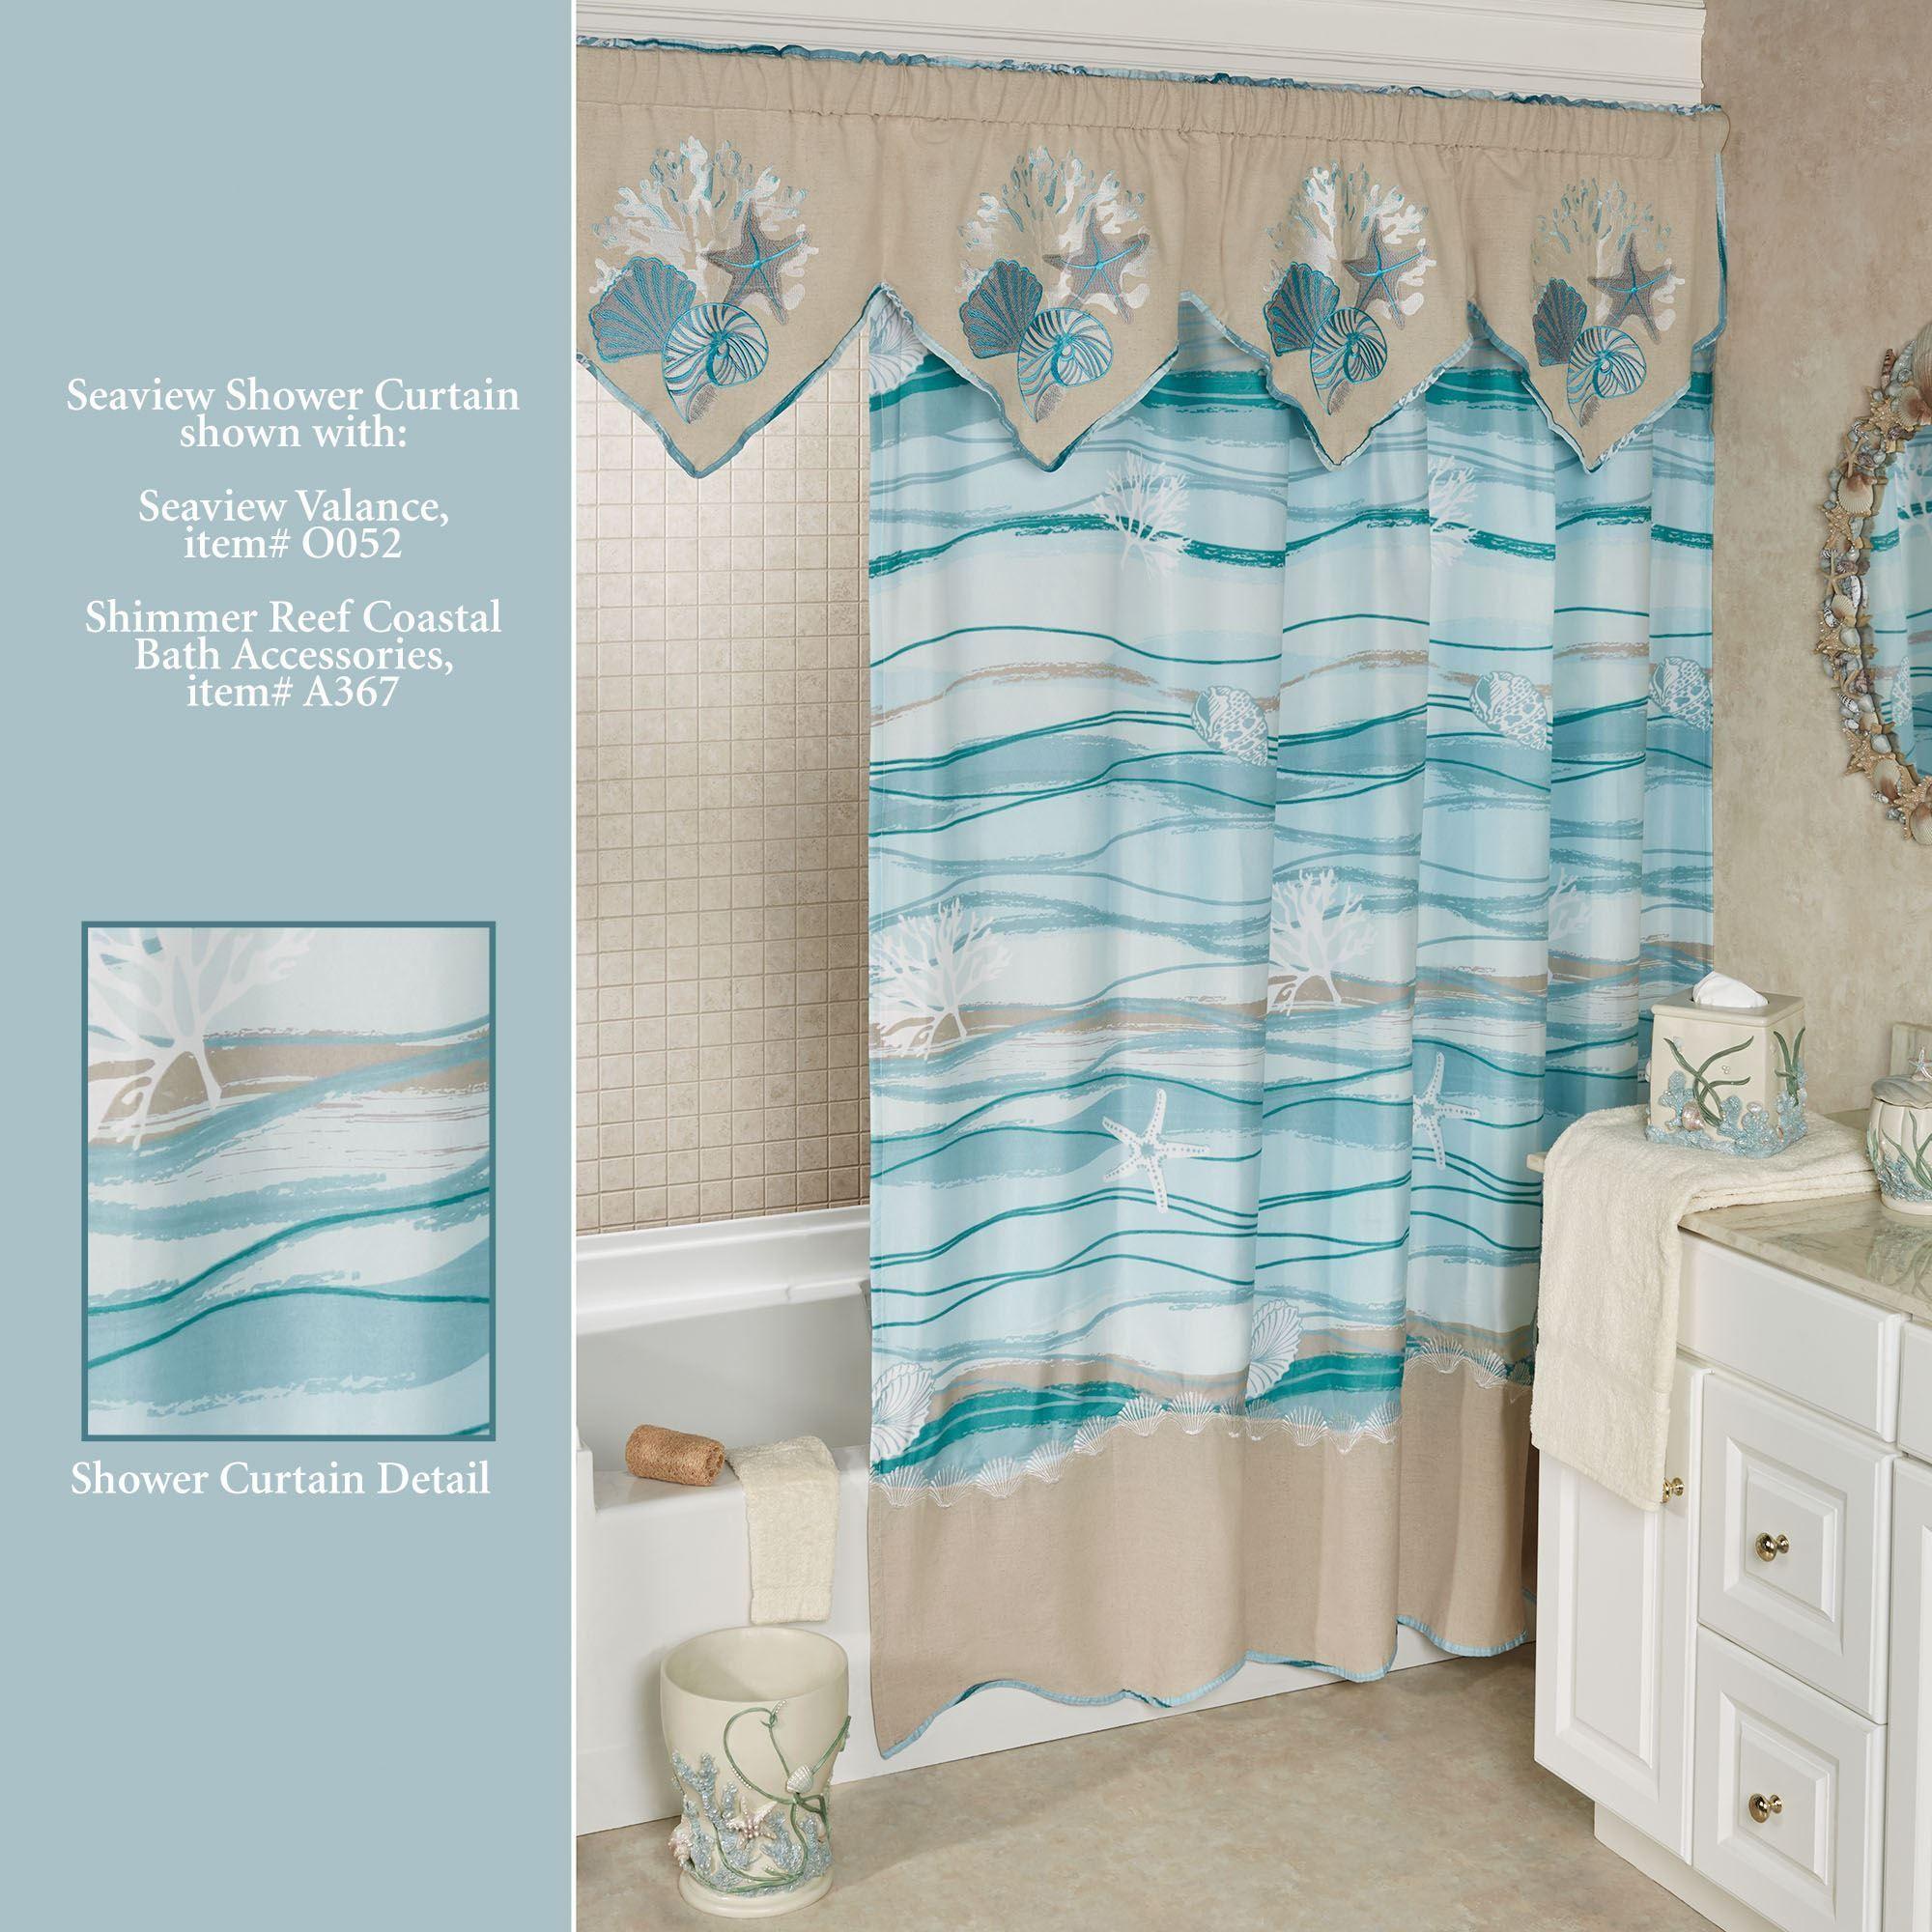 Seaview Wave Design Coastal Shower Curtain In 2020 Diy Bathroom